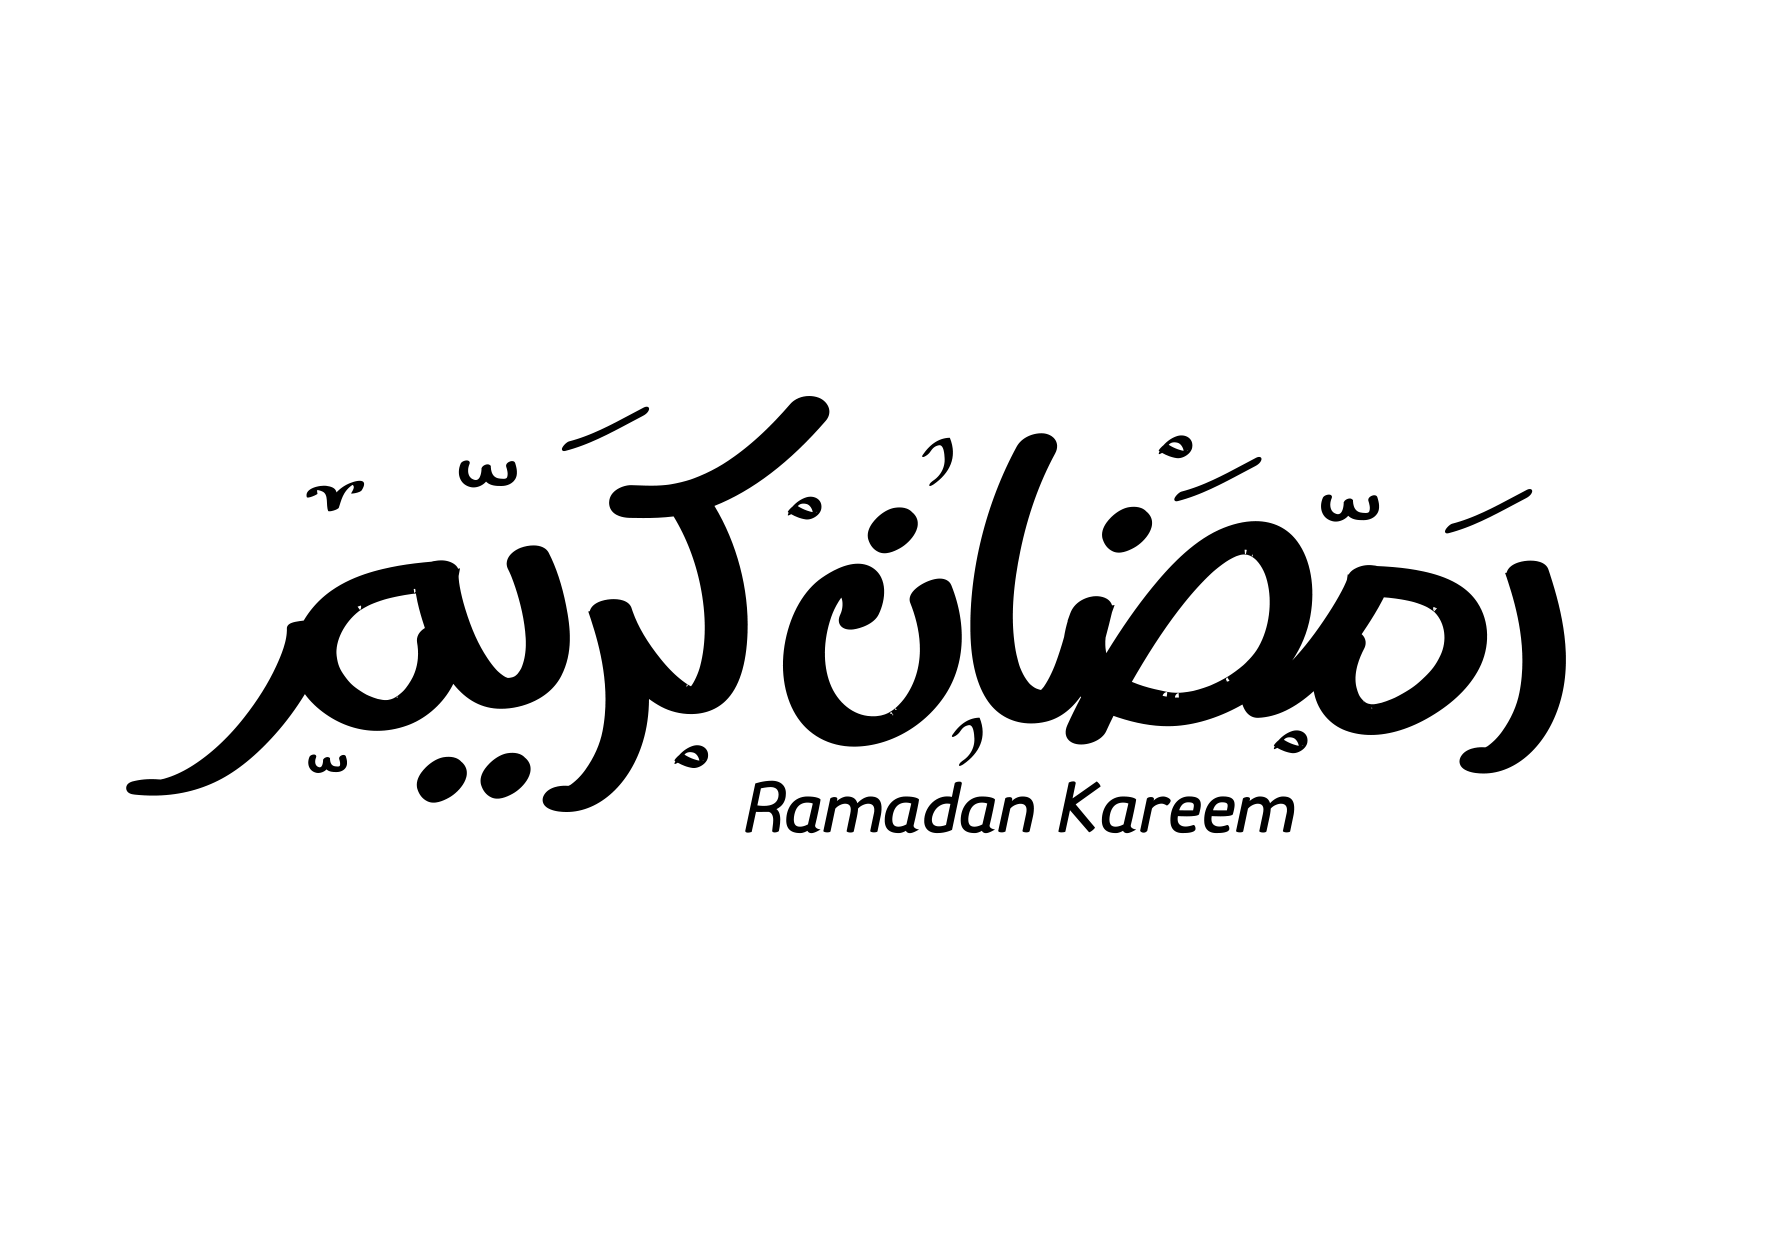 مخطوطه رمضان كريم مفرغه 3 15 مخطوطه لشهر رمضان بالخط الحر png